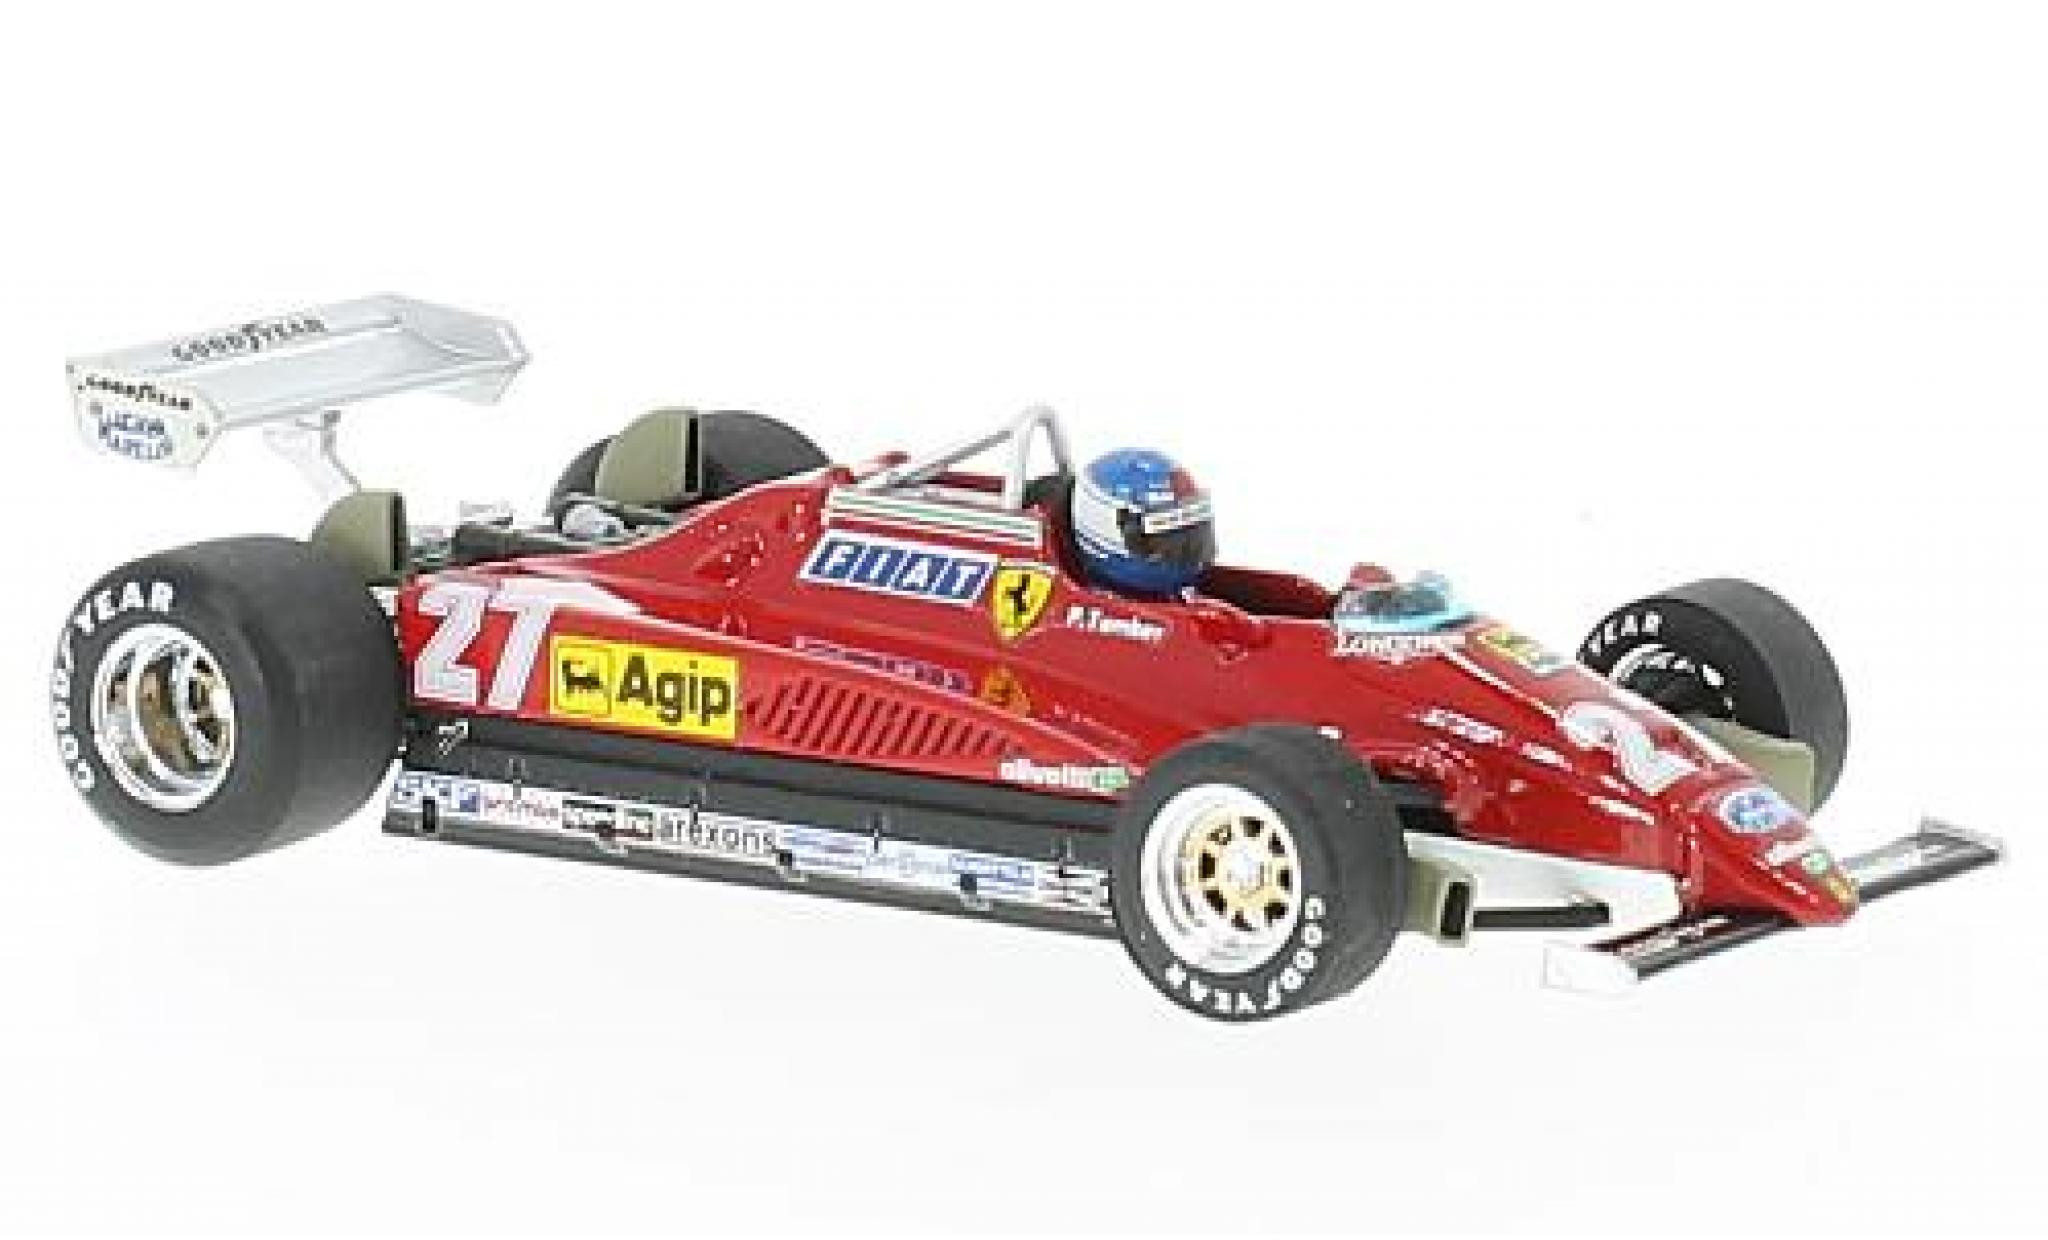 Ferrari 126 1/43 Brumm C2 turbo No.27 Formel 1 GP Italien 1982 avec figurine de conducteur P.Tambay